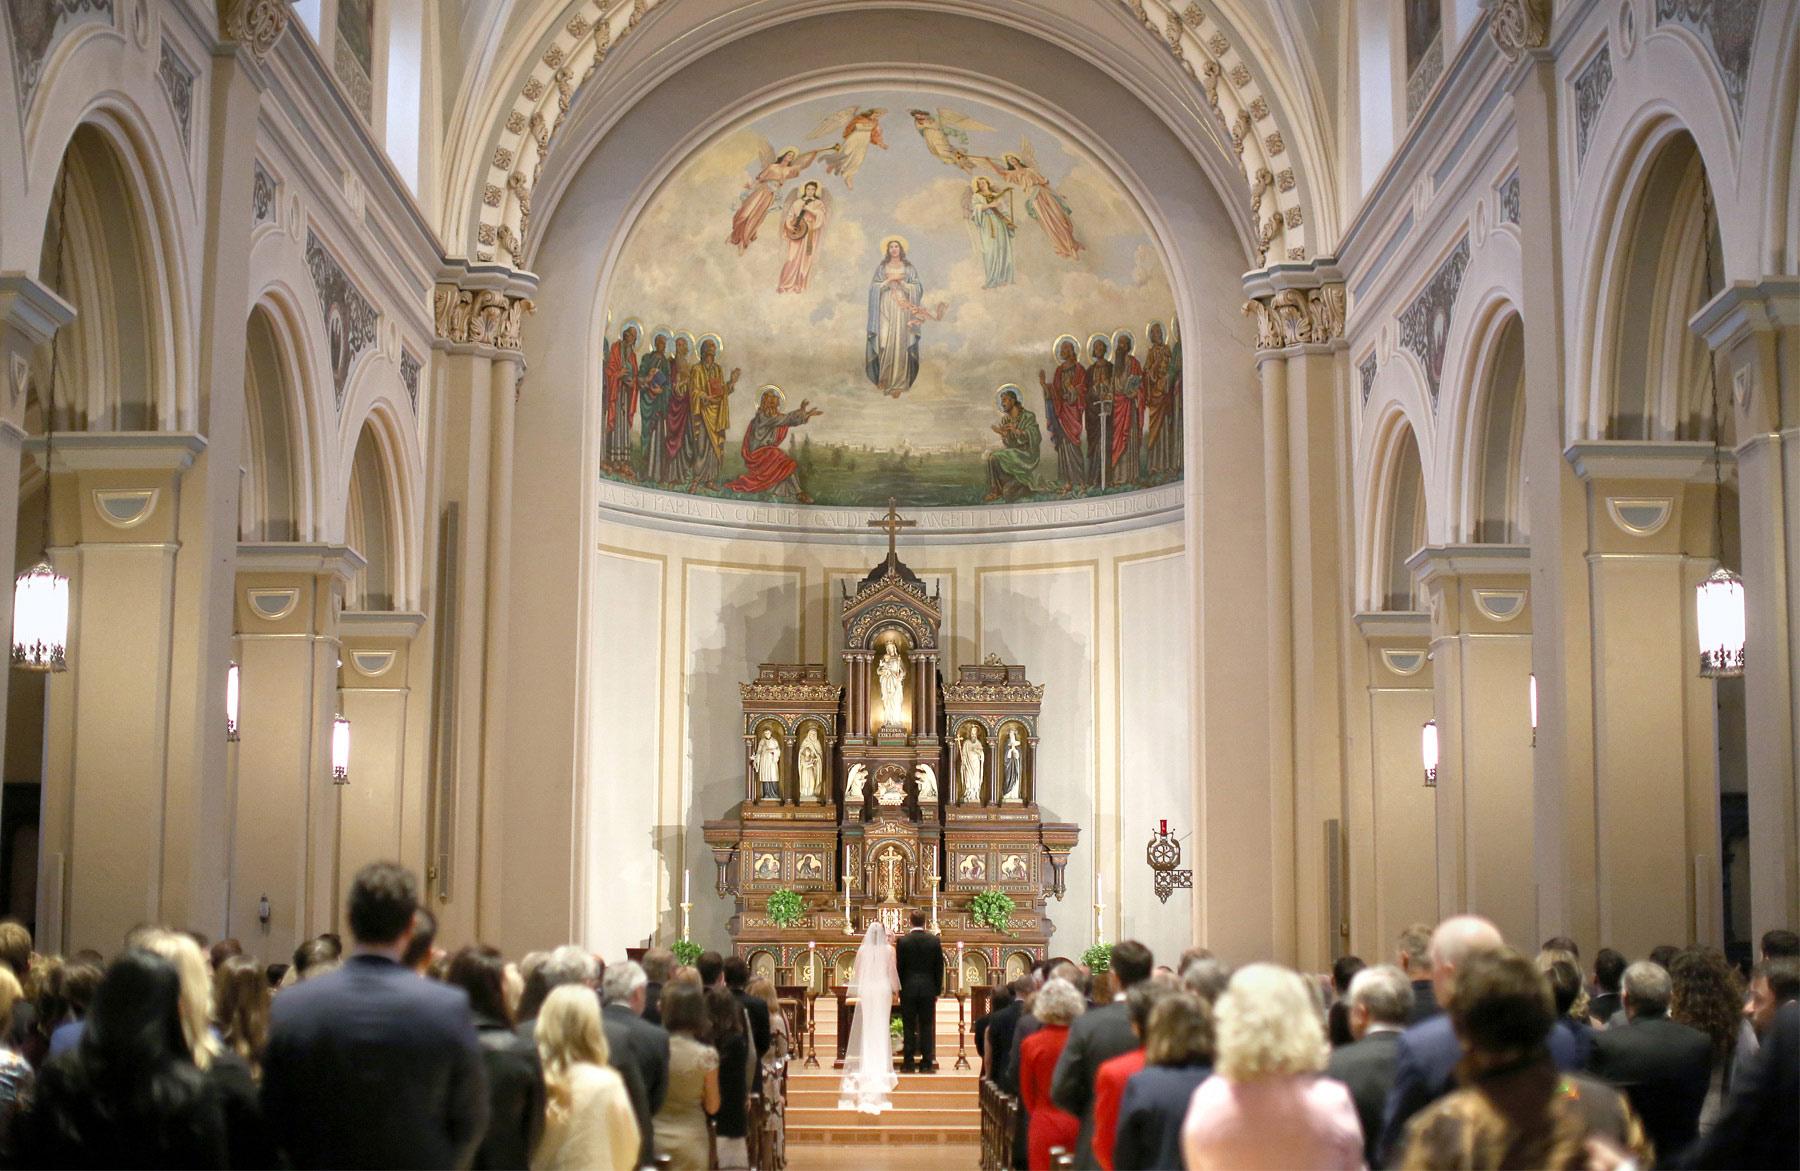 07-Saint-Paul-Minnesota-Wedding-Photographer-by-Andrew-Vick-Photography-Fall-Autumn-Church-of-the-Assumption-Ceremony-Bride-Groom-Kathryn-and-Sam.jpg